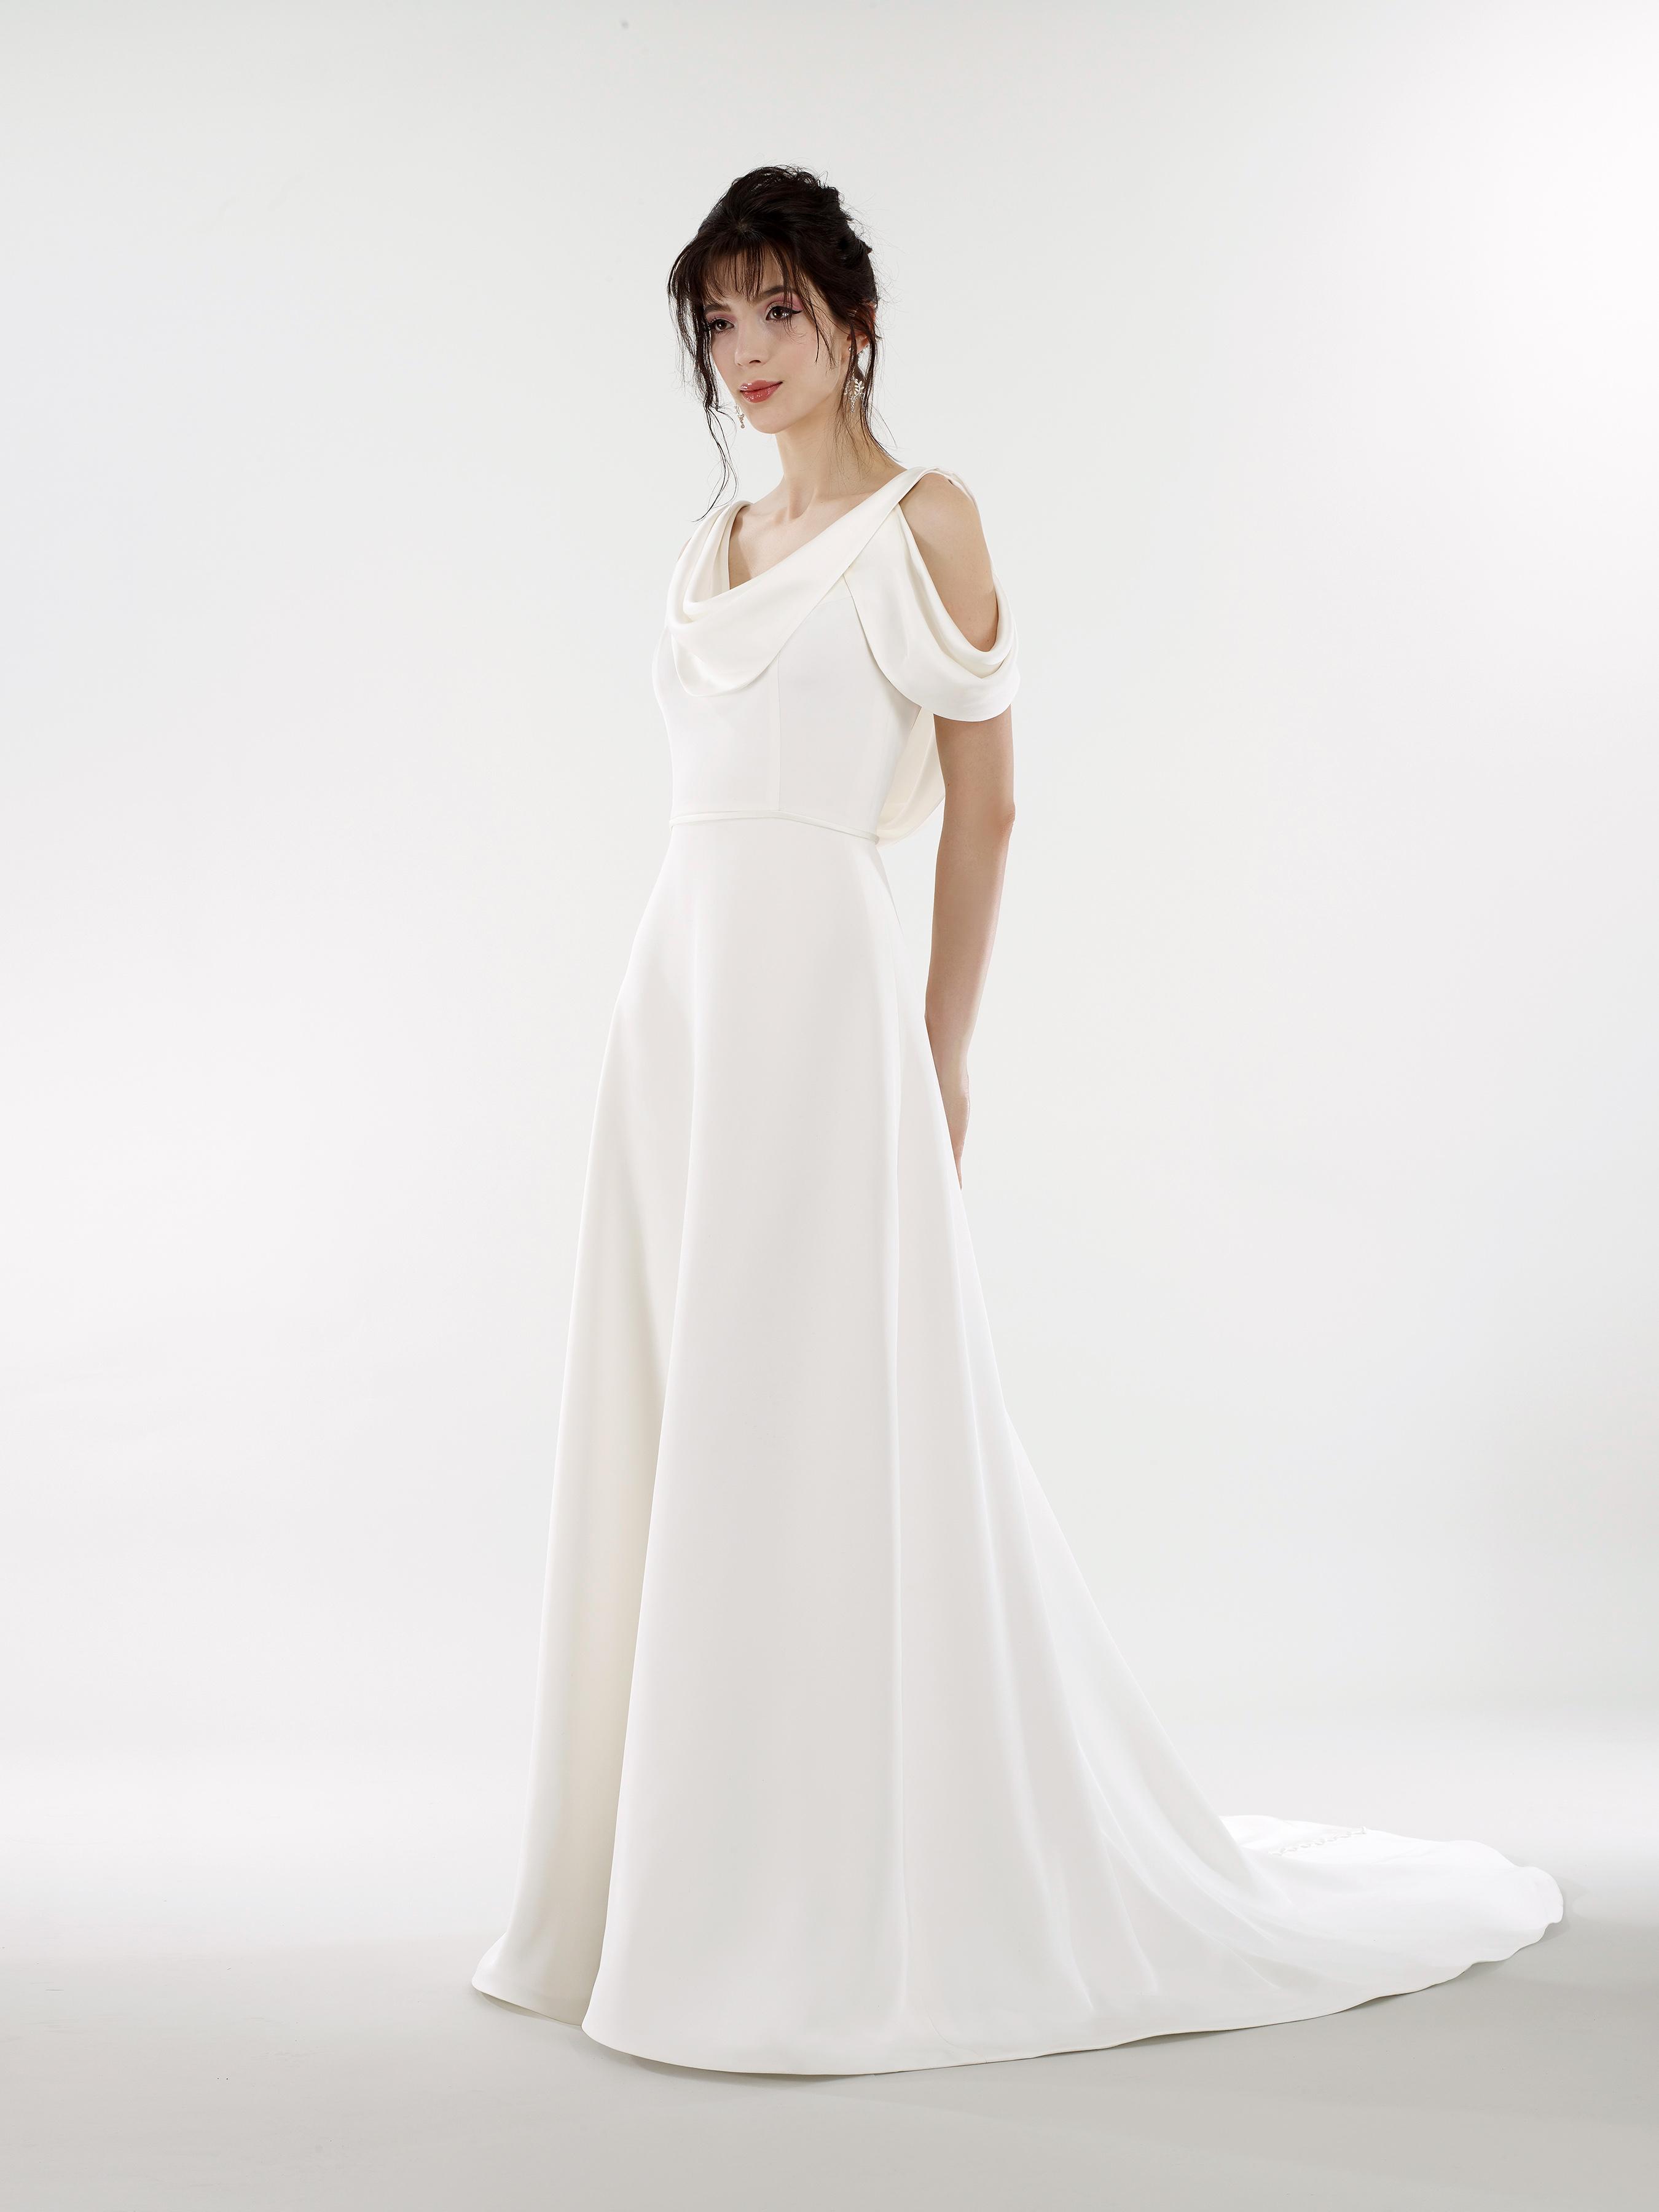 steven birnbaum bridal wedding dress spring 2019 cold shoulder drape cutout a-line